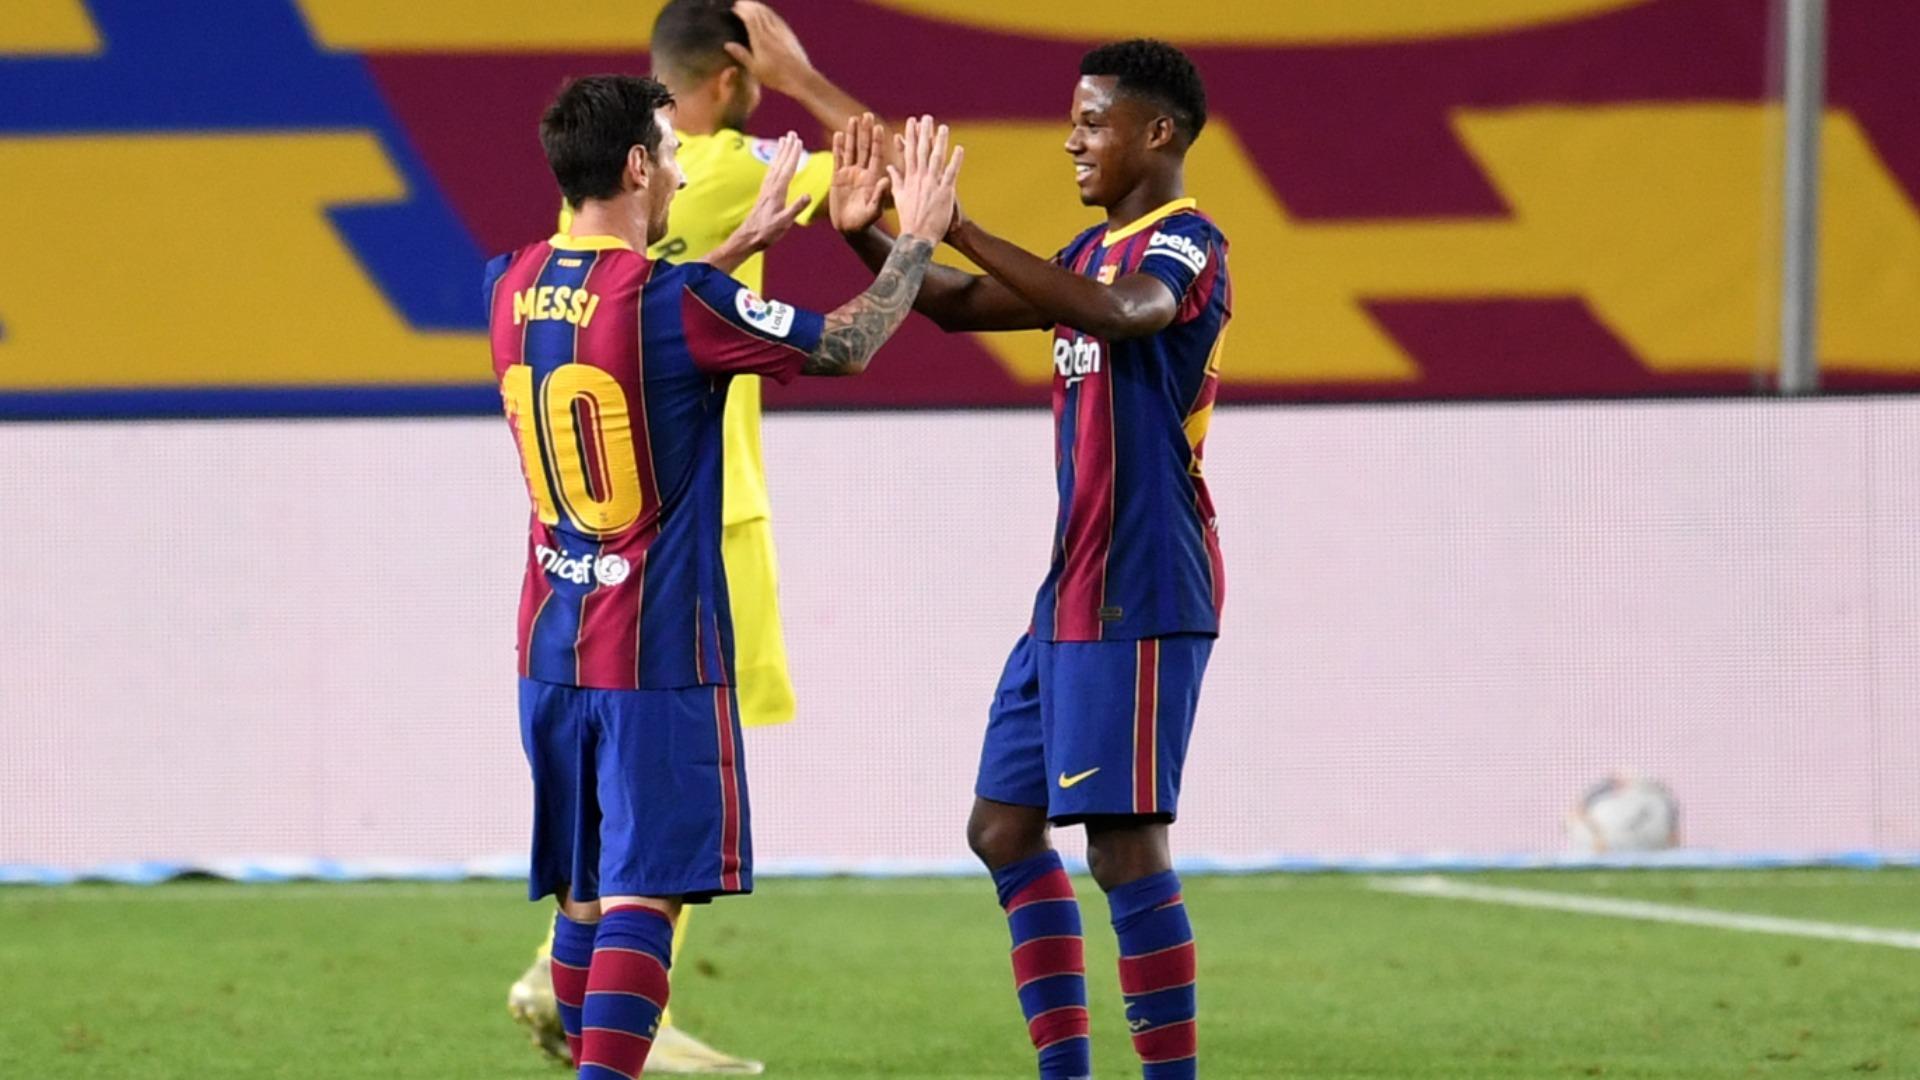 Barcelona 4-0 Villarreal: Fati and Messi get Koeman off to flying start in LaLiga